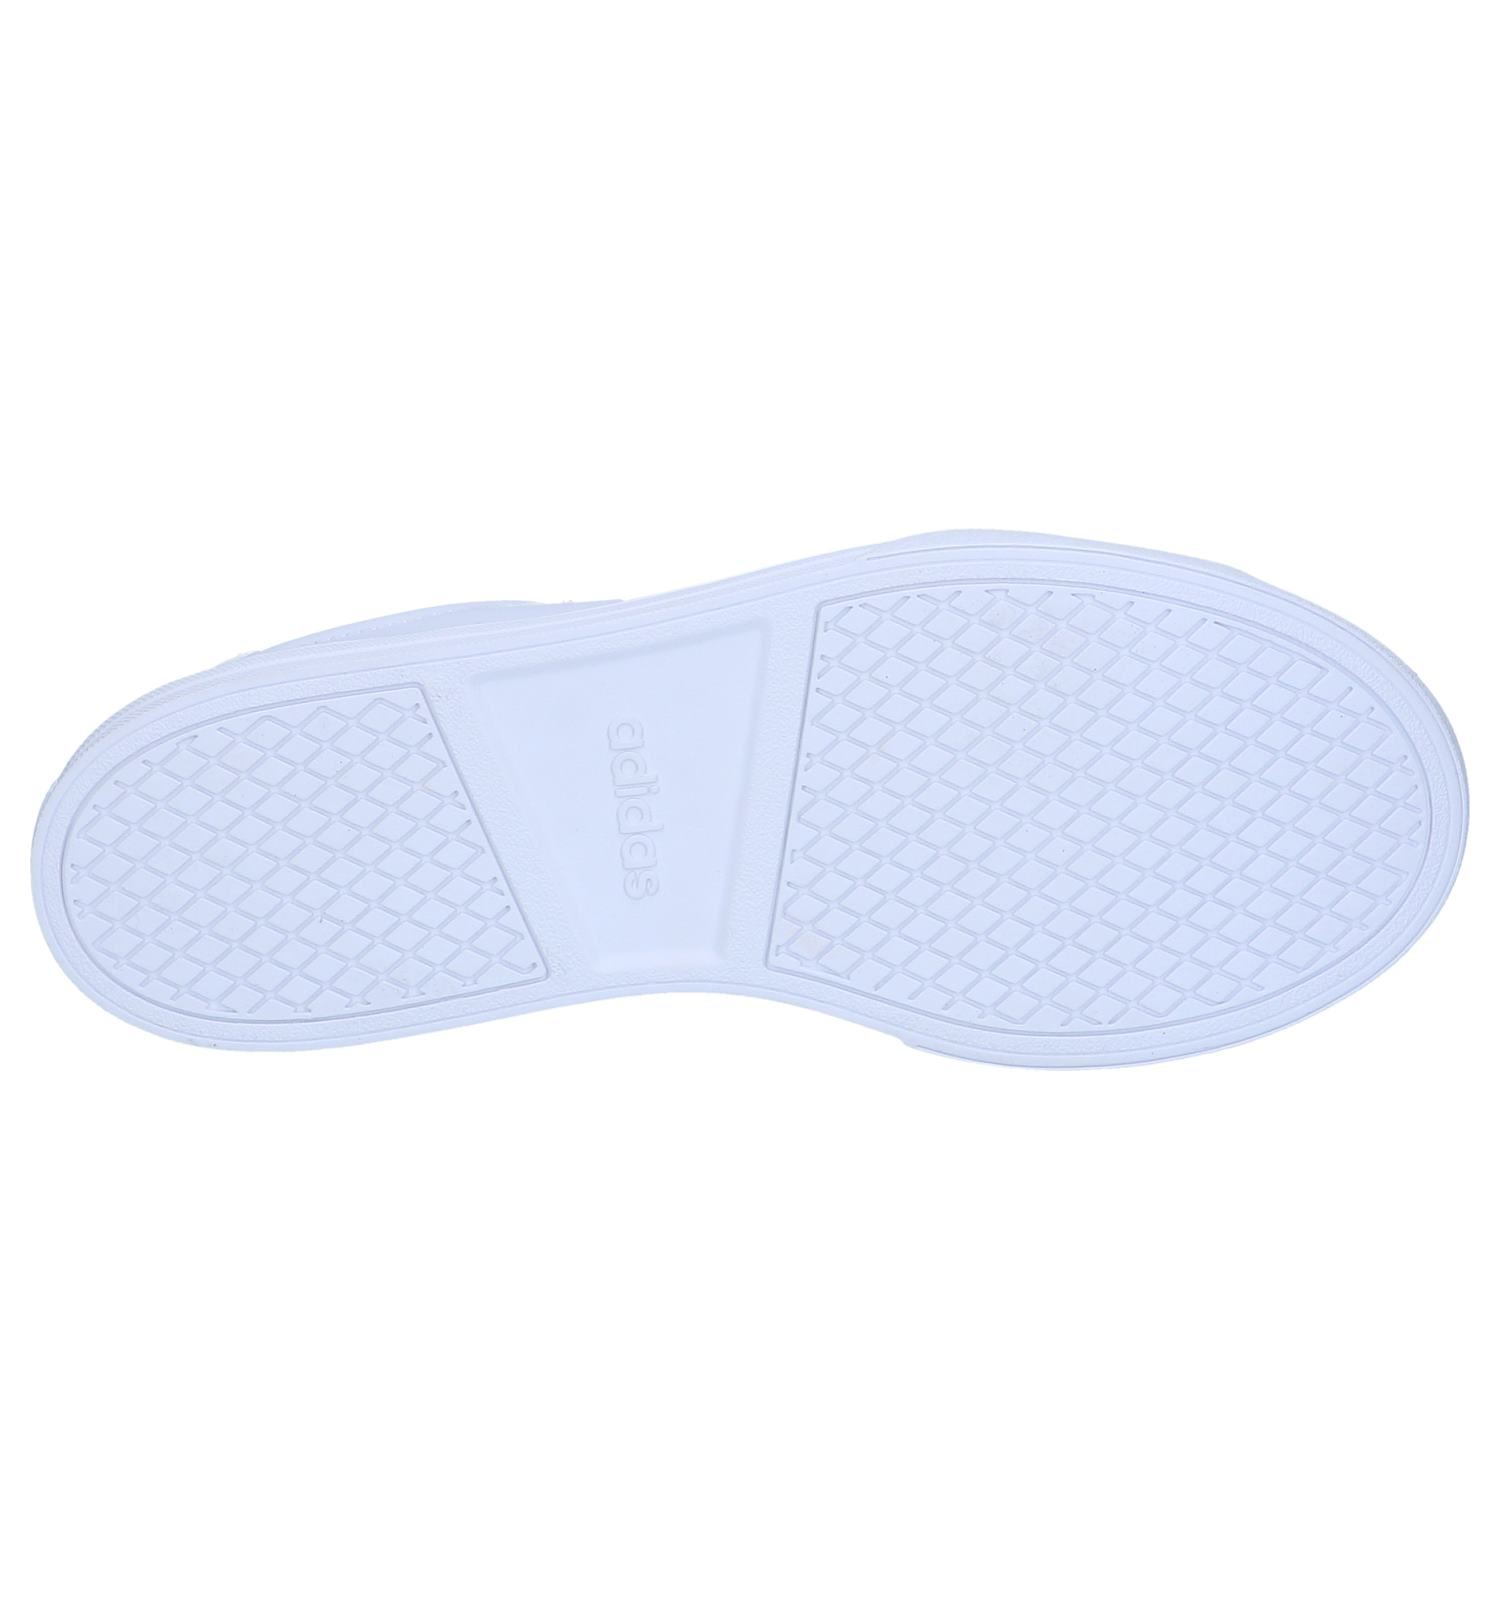 Witte Sneakers adidas Daily 2.0   SCHOENENTORFS.NL   Gratis